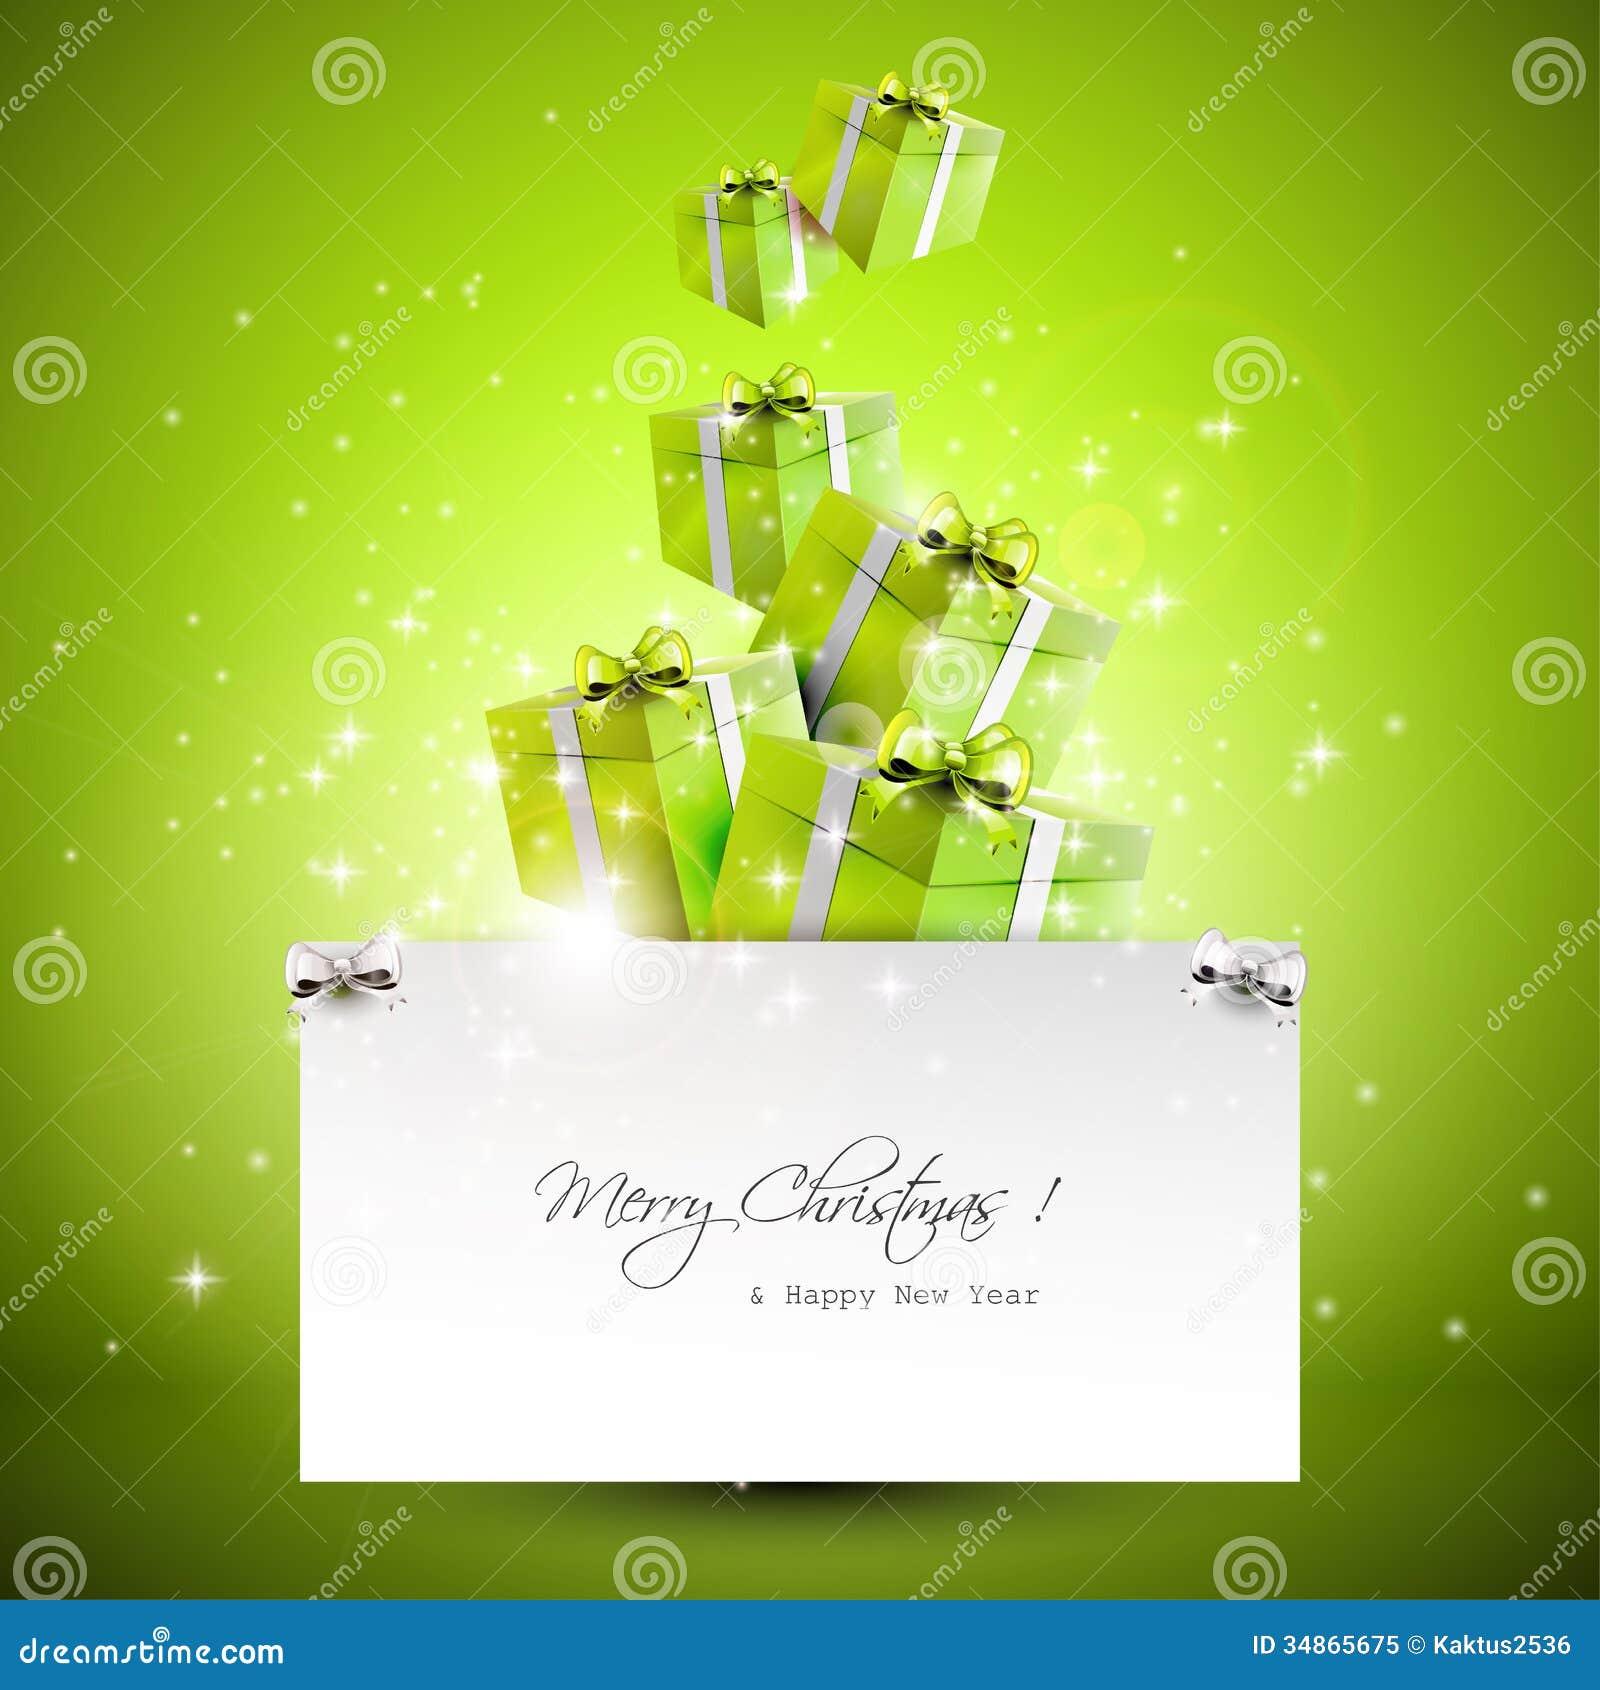 modern christmas greeting card royalty free stock photo